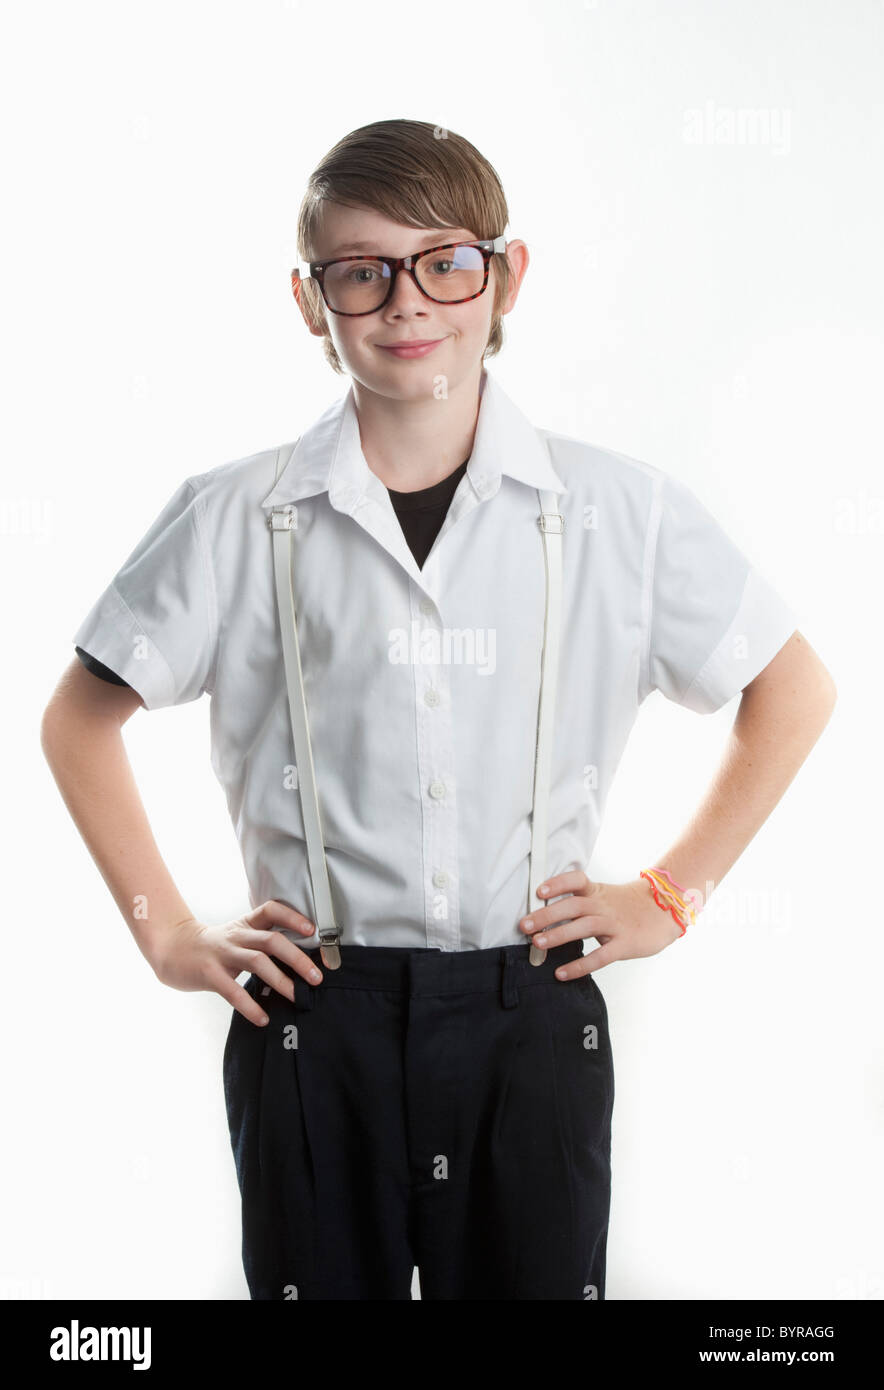 Dans les verres nerdy kid Photo Stock